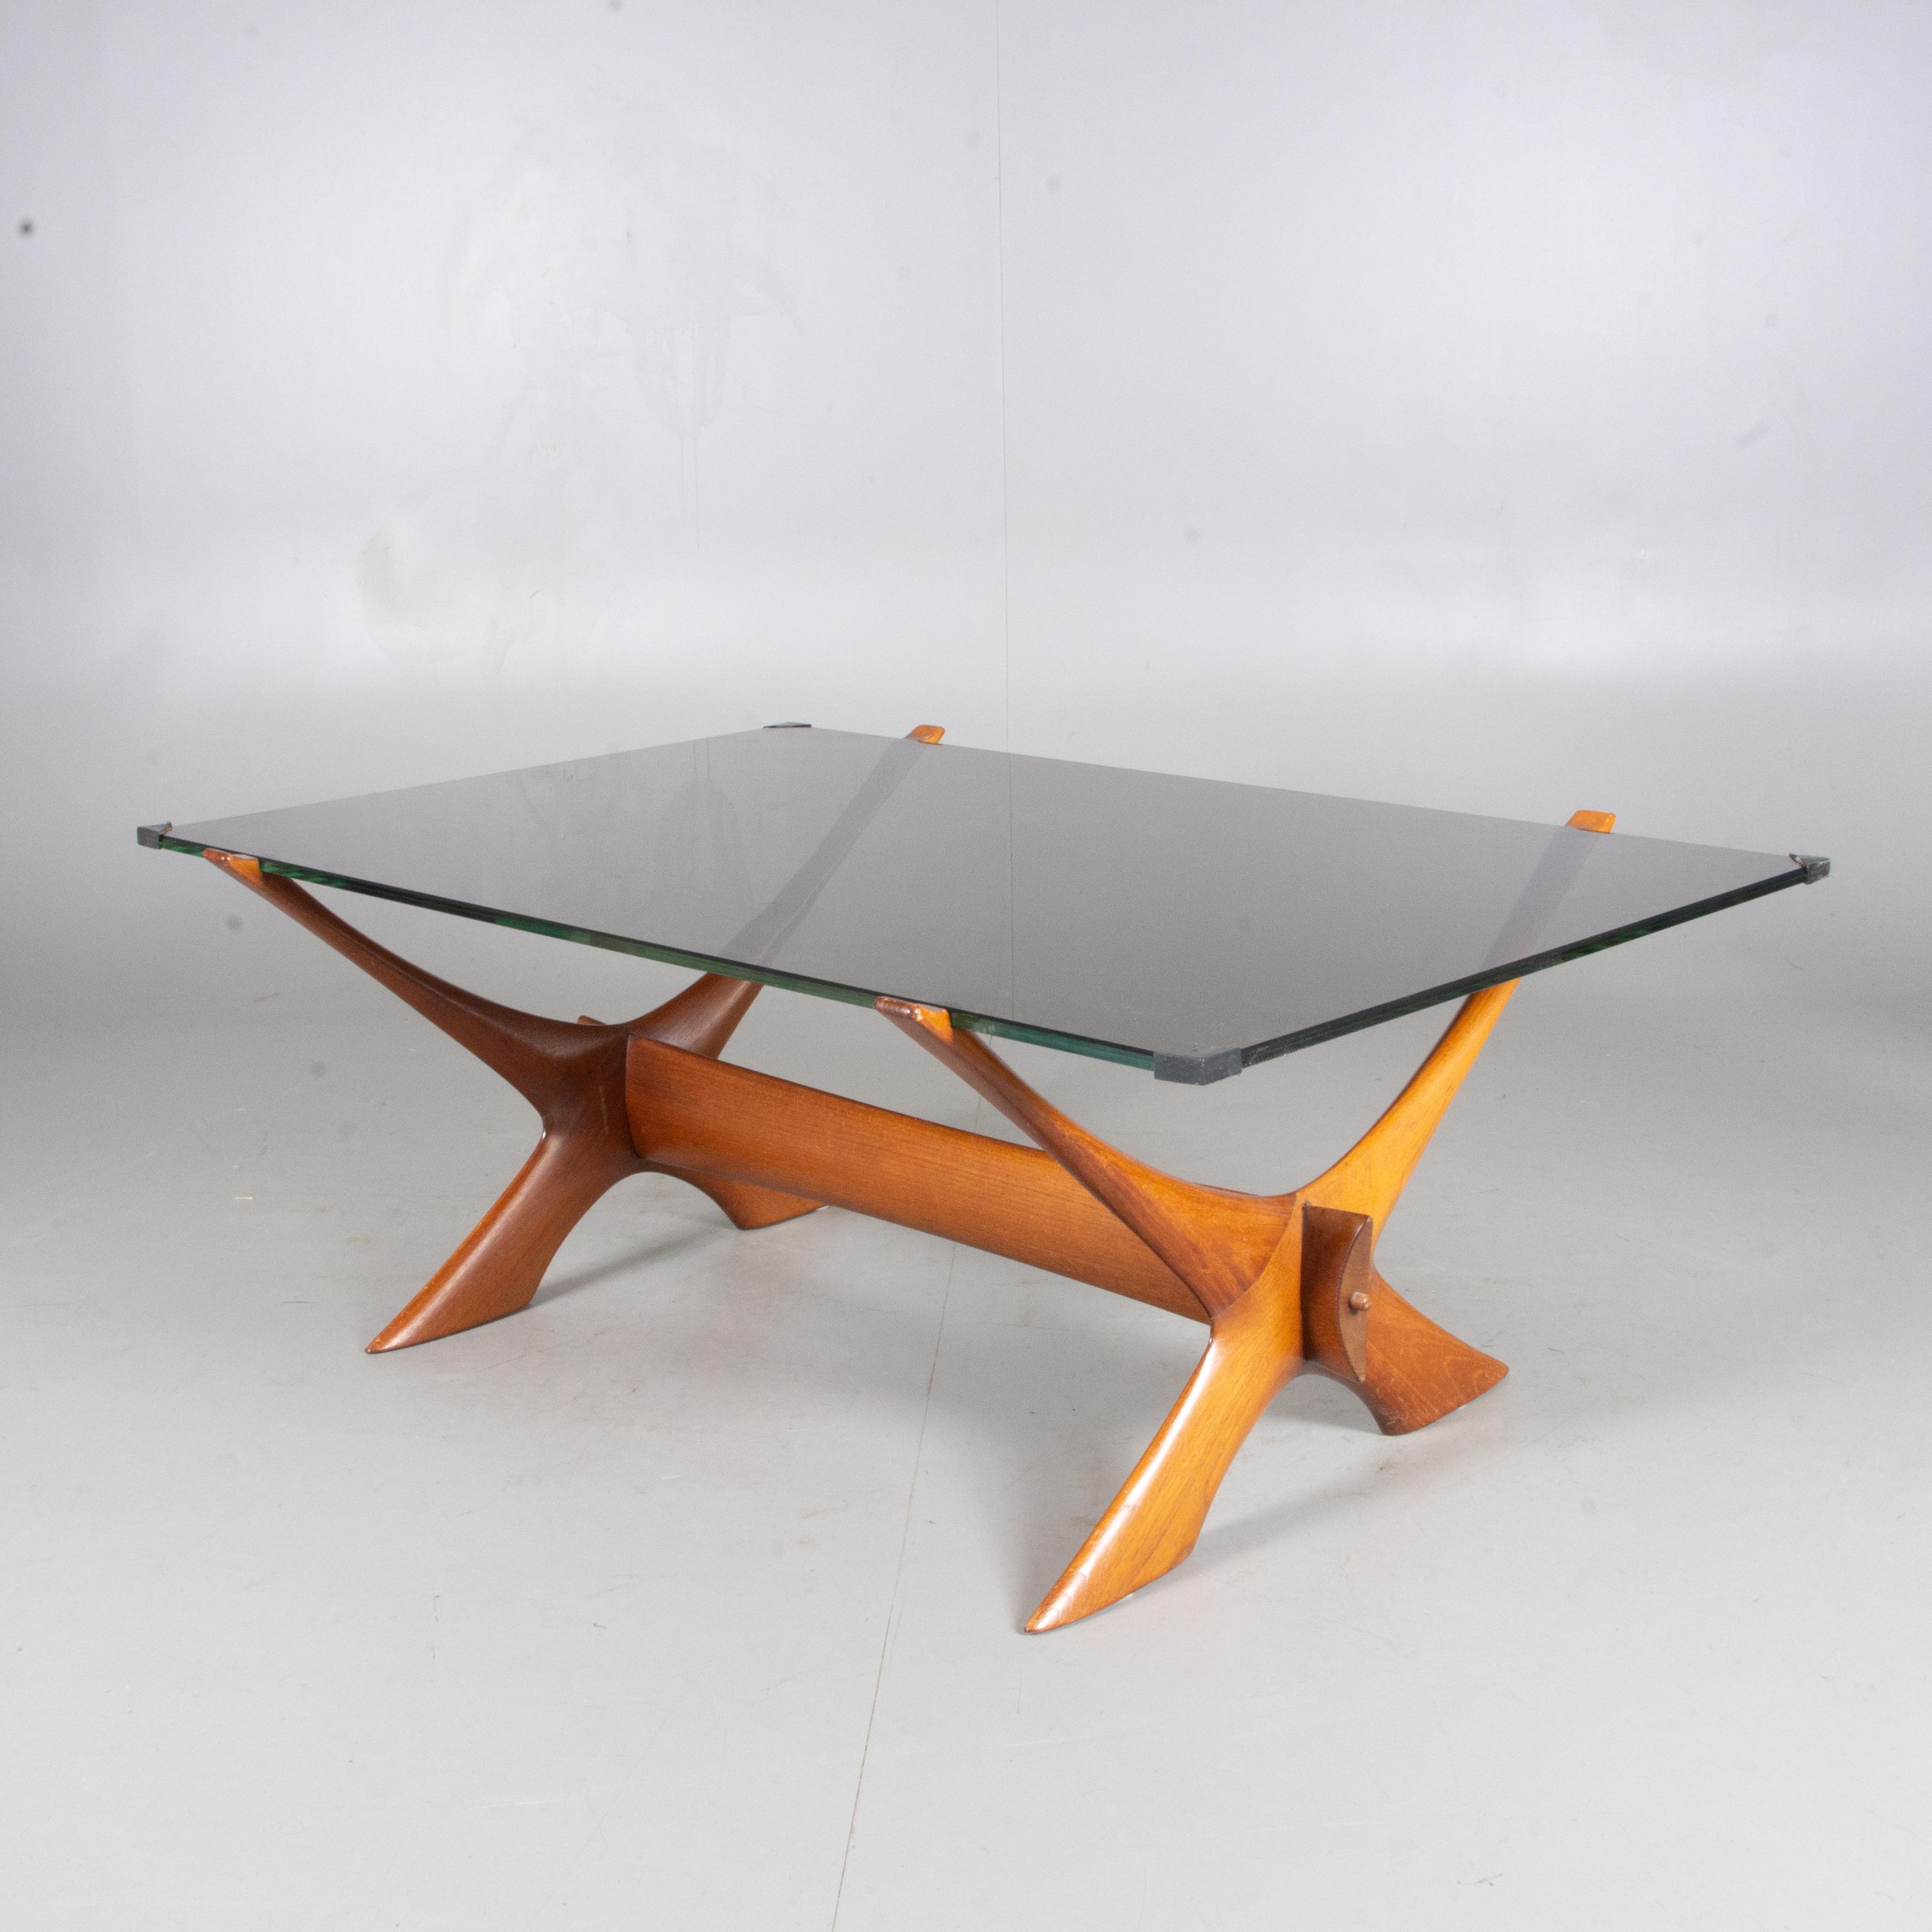 Coffee table, teak and glass, Fredrik Schriever Abeln